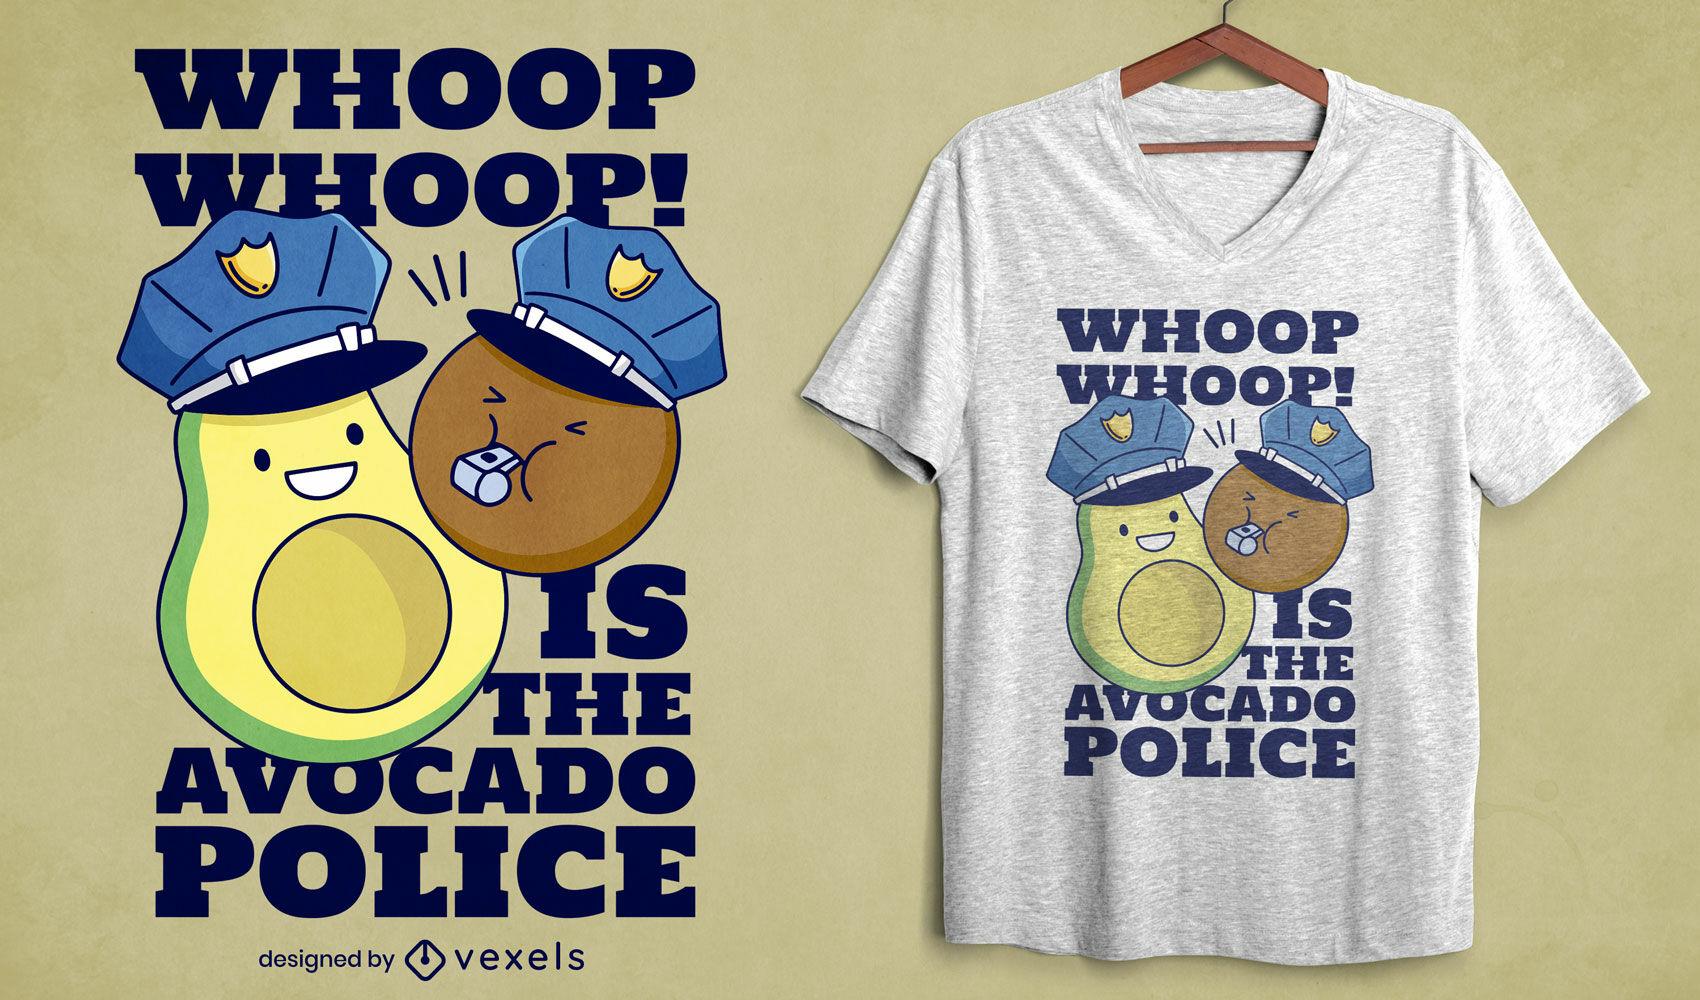 Lustiges Avocado-Polizei-T-Shirt-Design